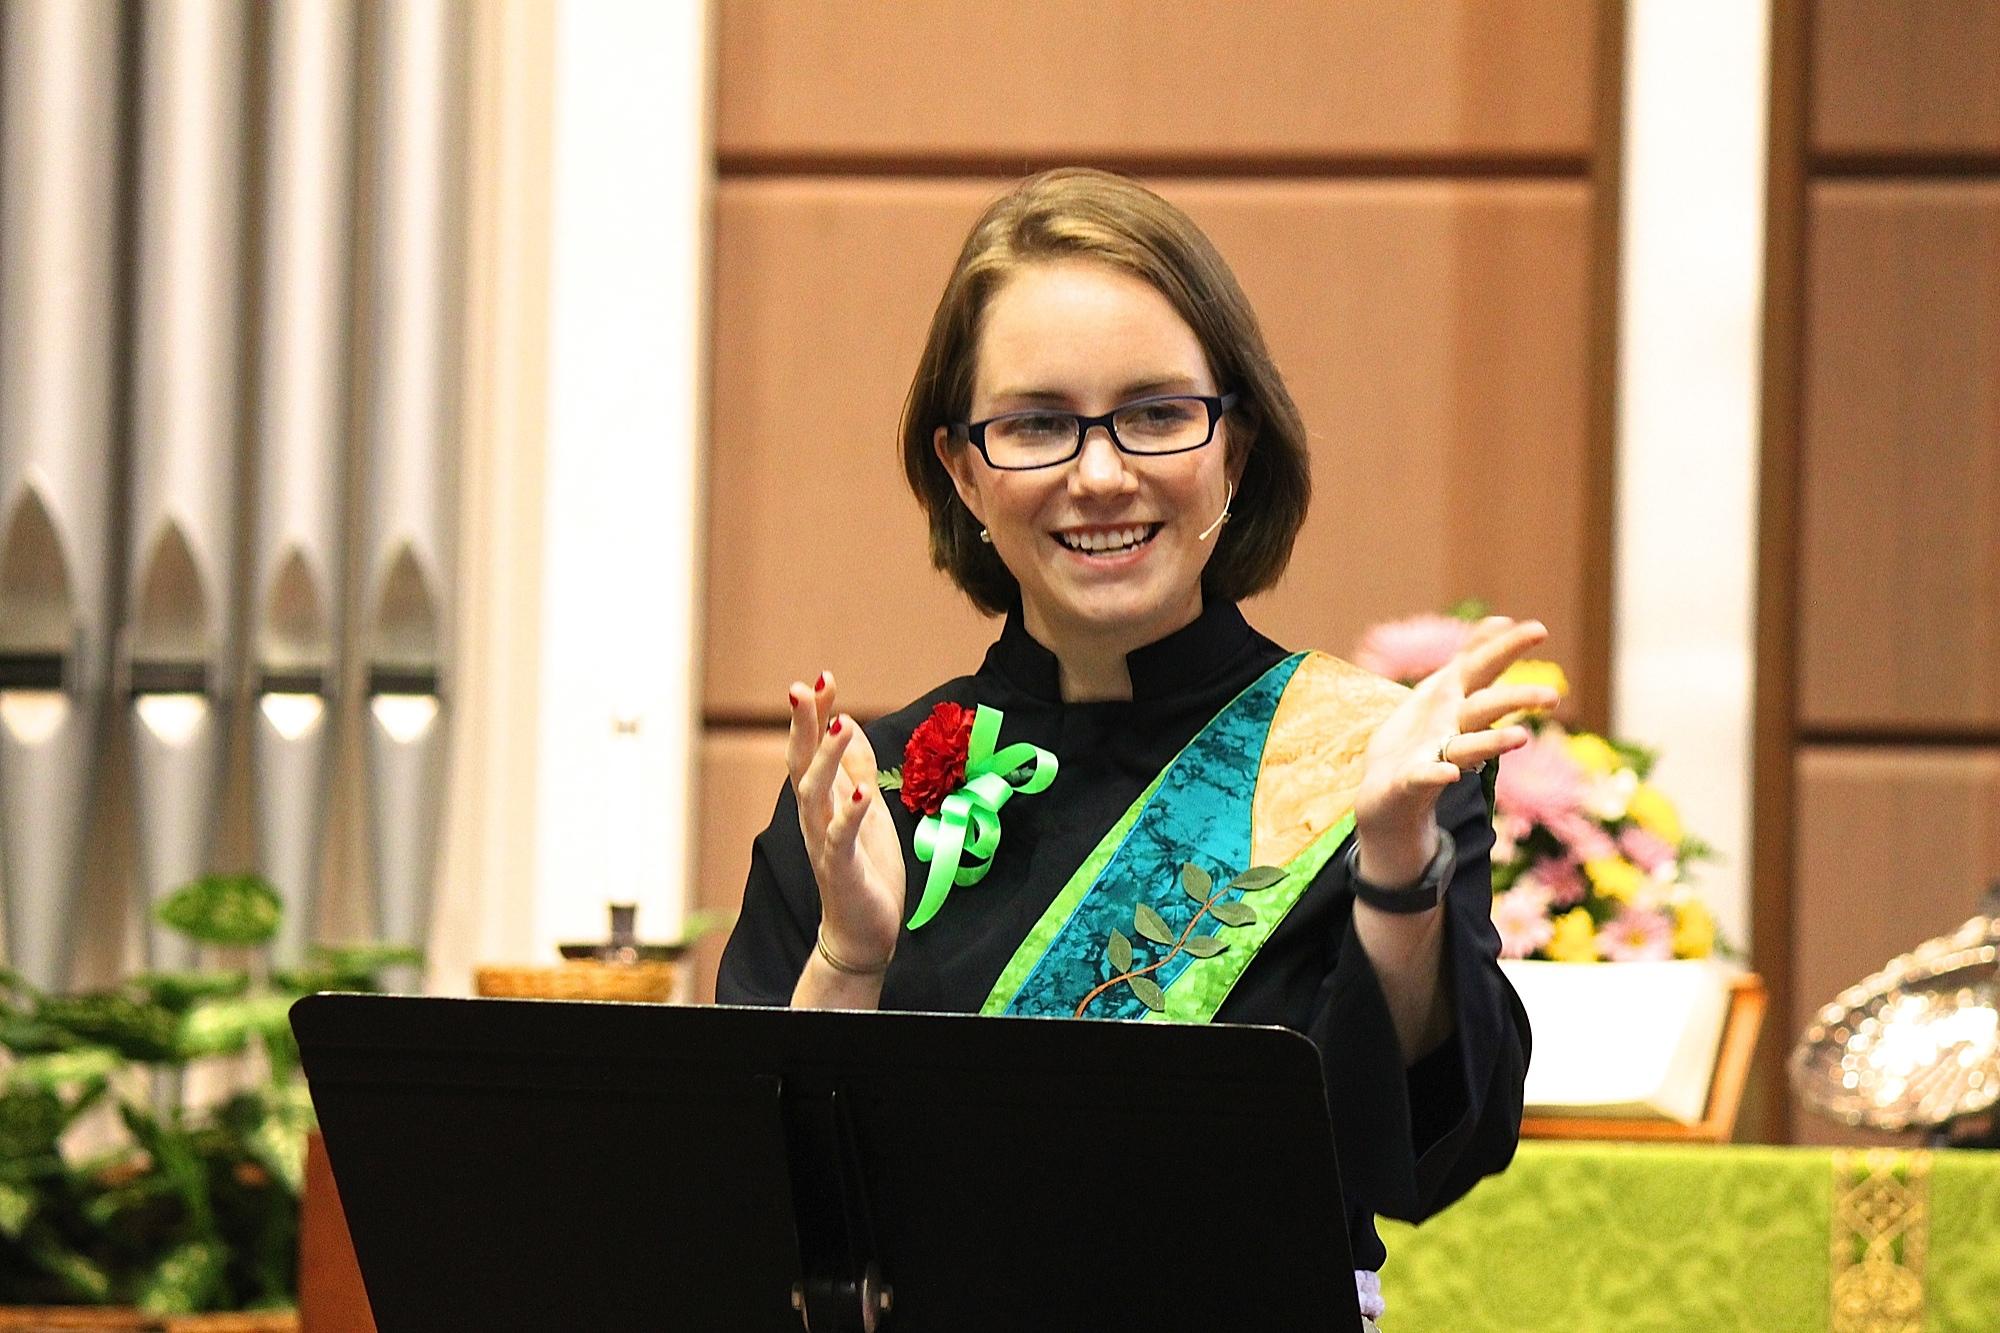 Melissa Preaching copy.jpg